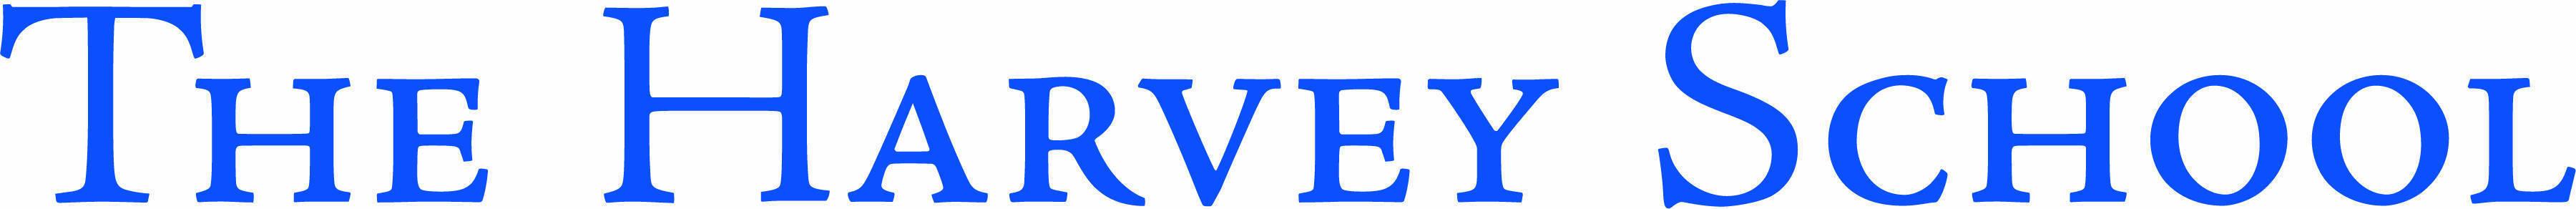 9b41058356d1e999ca86 harveylogotype blue 2015  8